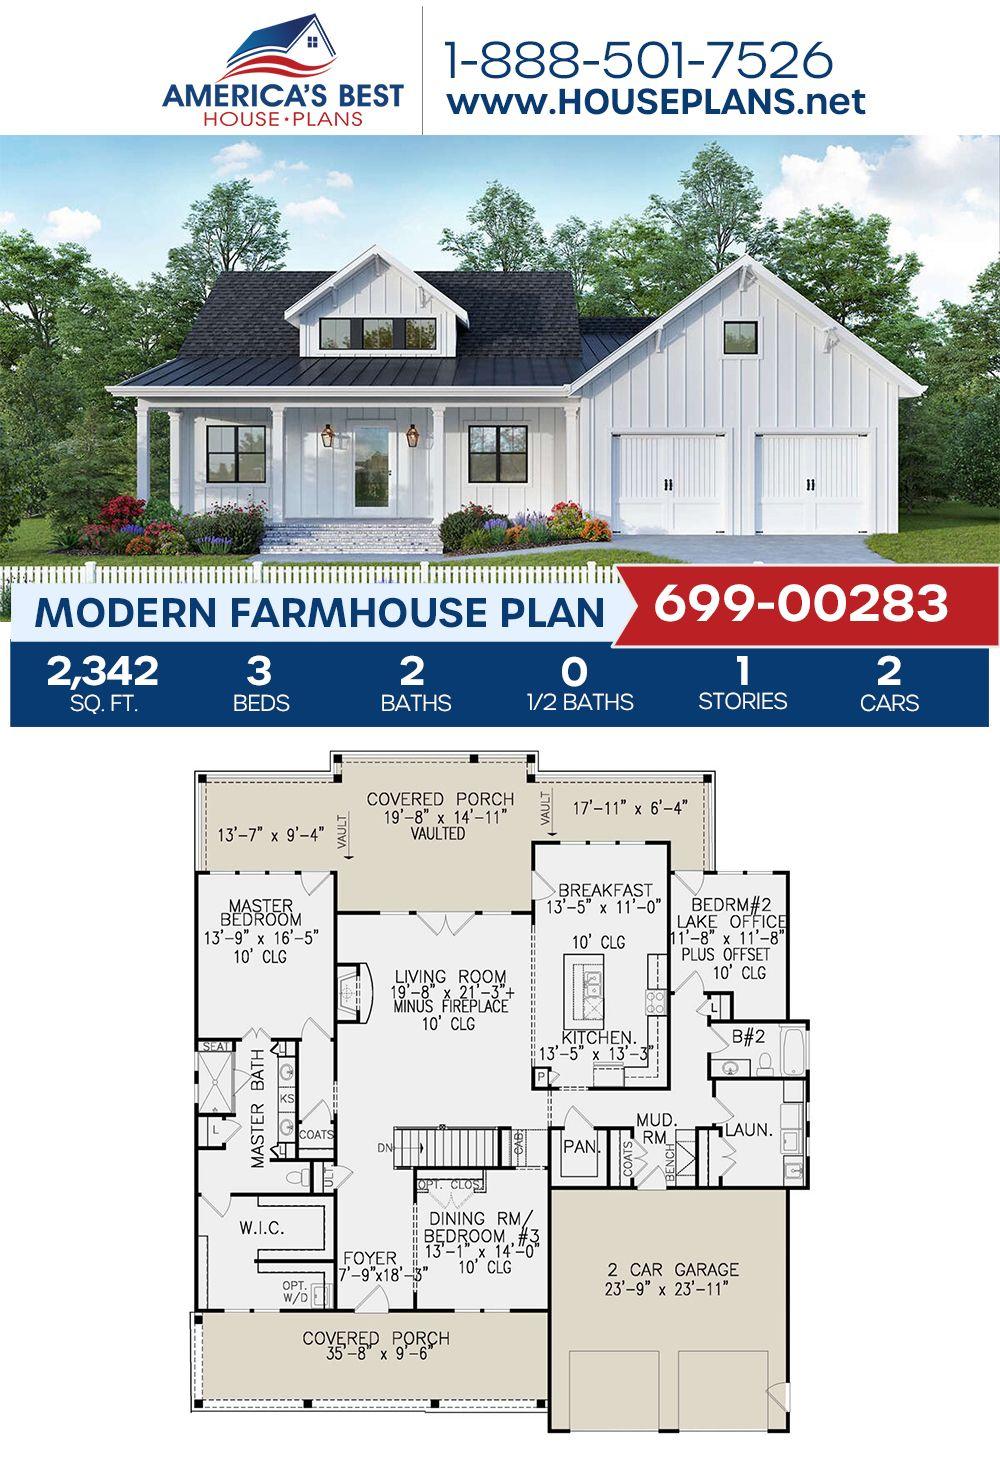 House Plan 699 00283 Modern Farmhouse Plan 2 342 Square Feet 3 Bedrooms 2 Bathrooms In 2020 Modern Farmhouse Plans House Plans Farmhouse Farmhouse Plans